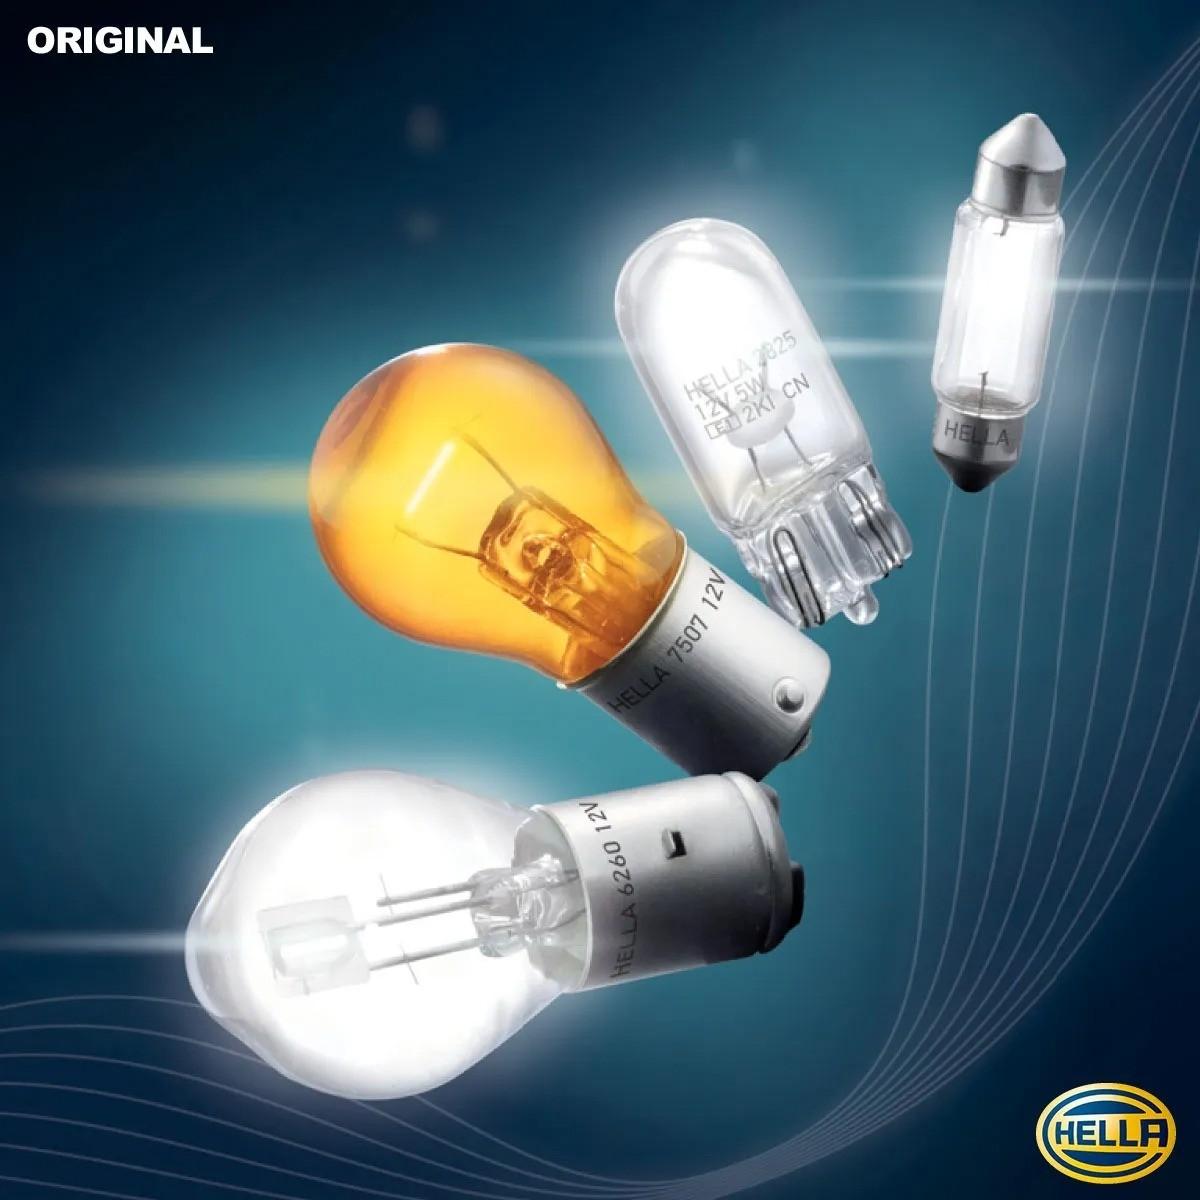 LAMPADA CONVENCIONAL  12V 21W FAROL H21 UNIVERSAL HELLA